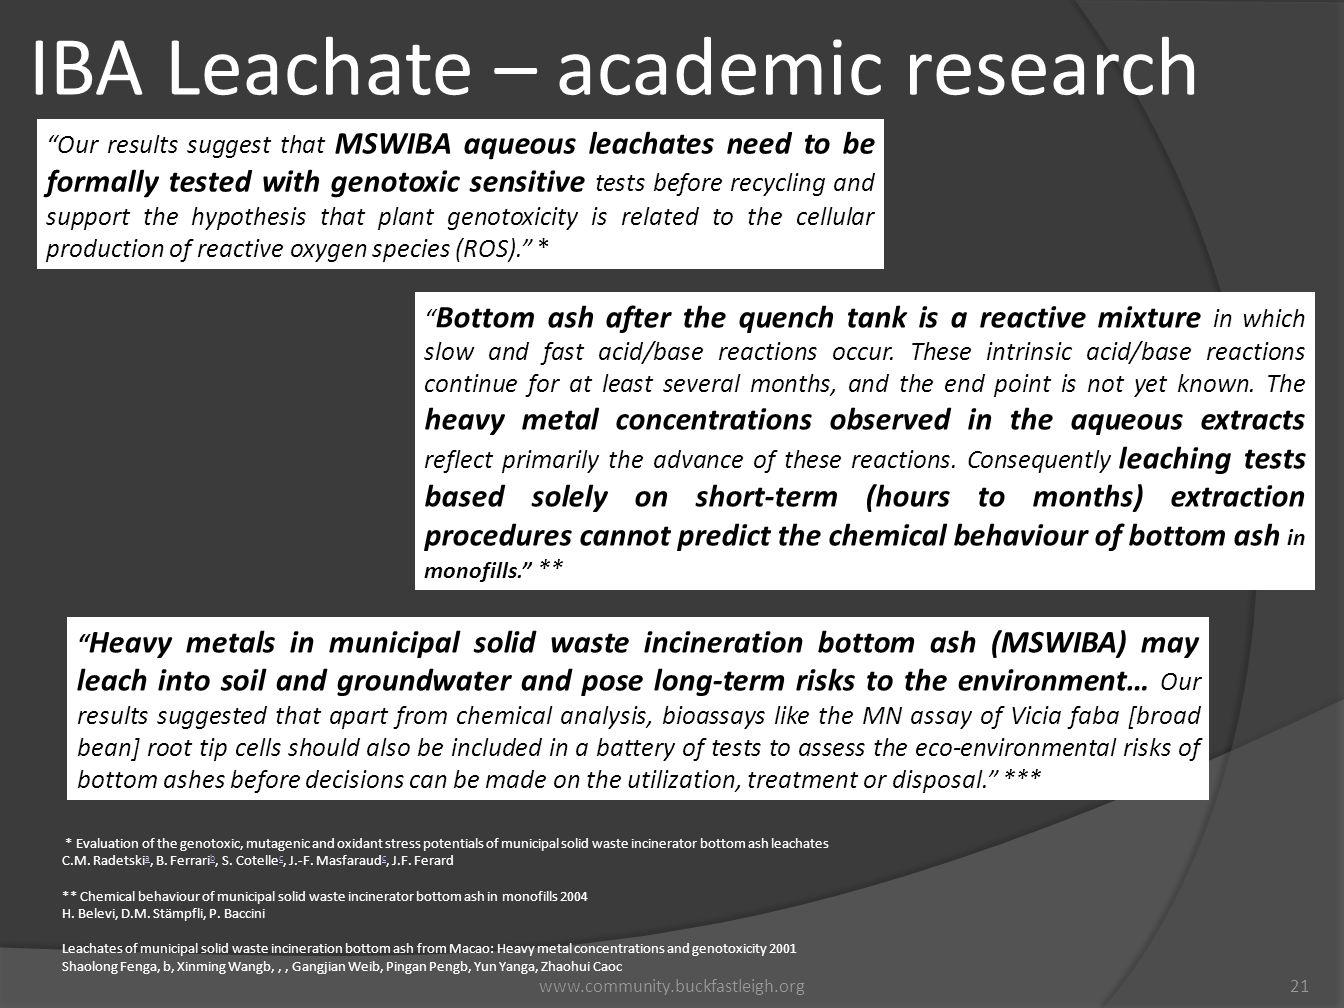 IBA Leachate – academic research